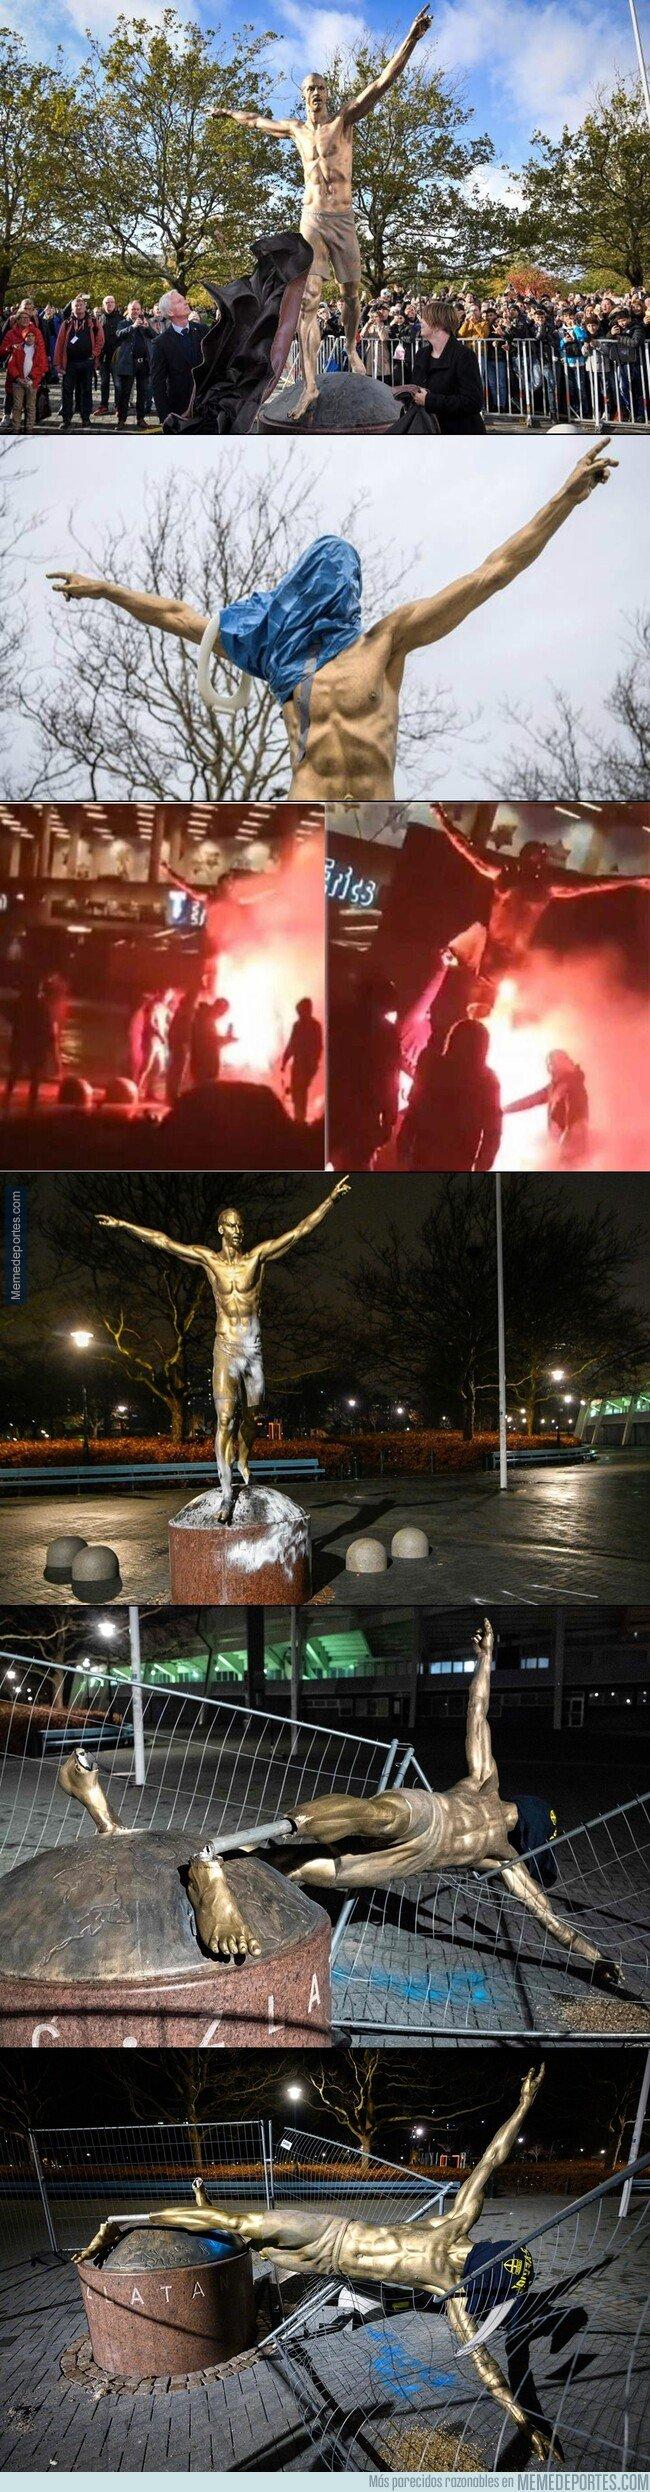 1095111 - La estatua de Zlatan finalmente ha sido derribada.